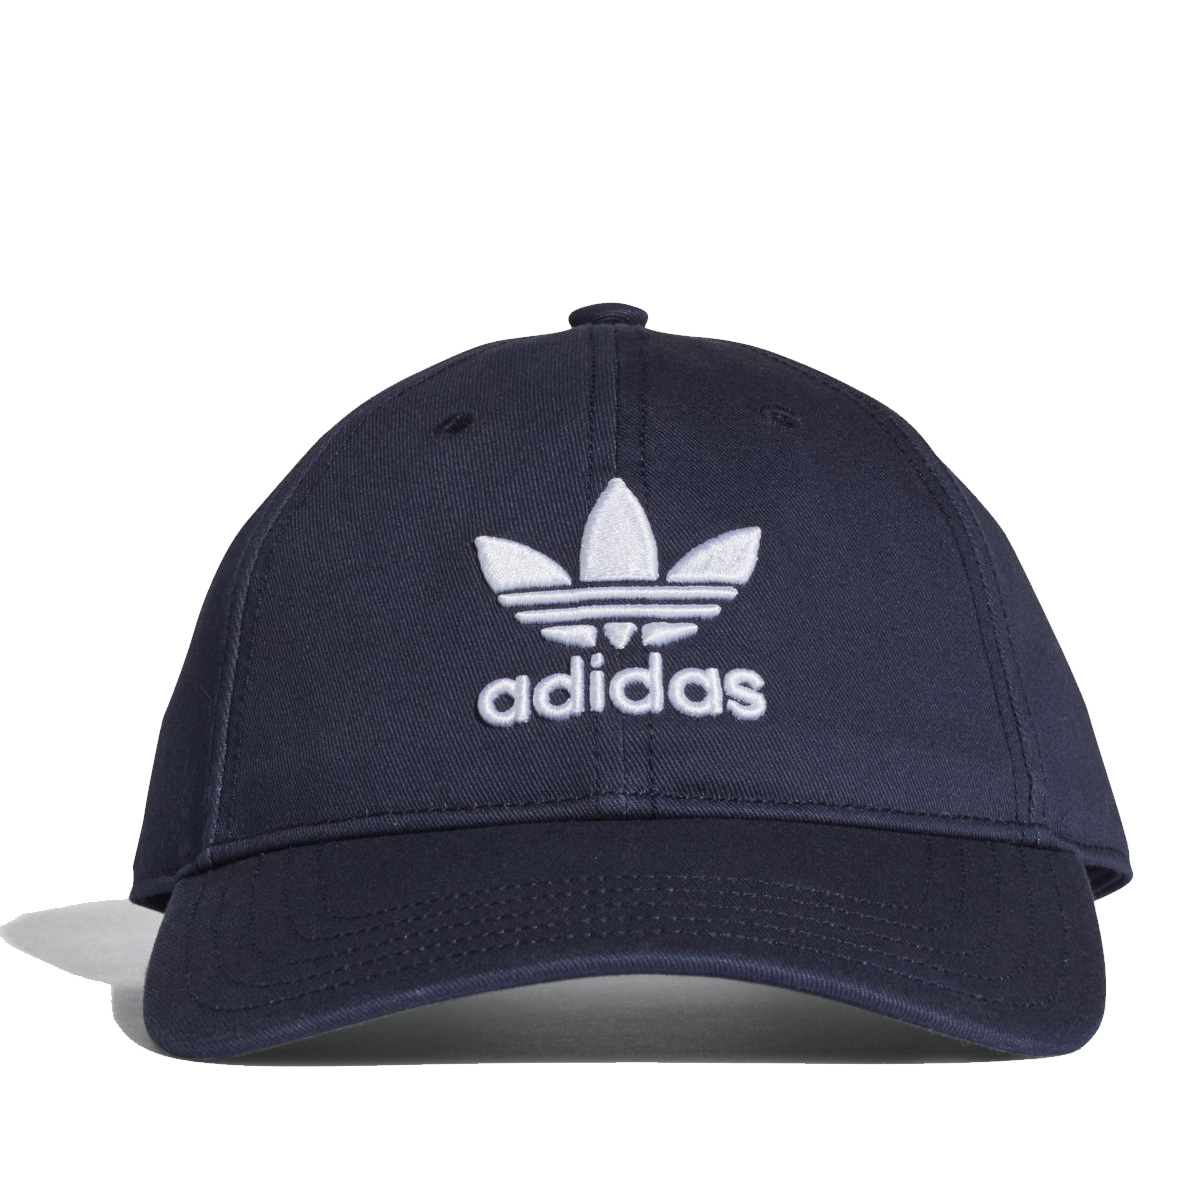 adidas Originals TREFOIL CAP (アディダス オリジナルス トレフォイル キャップ)  CollegiateNavy White  帽子  f68402f494db